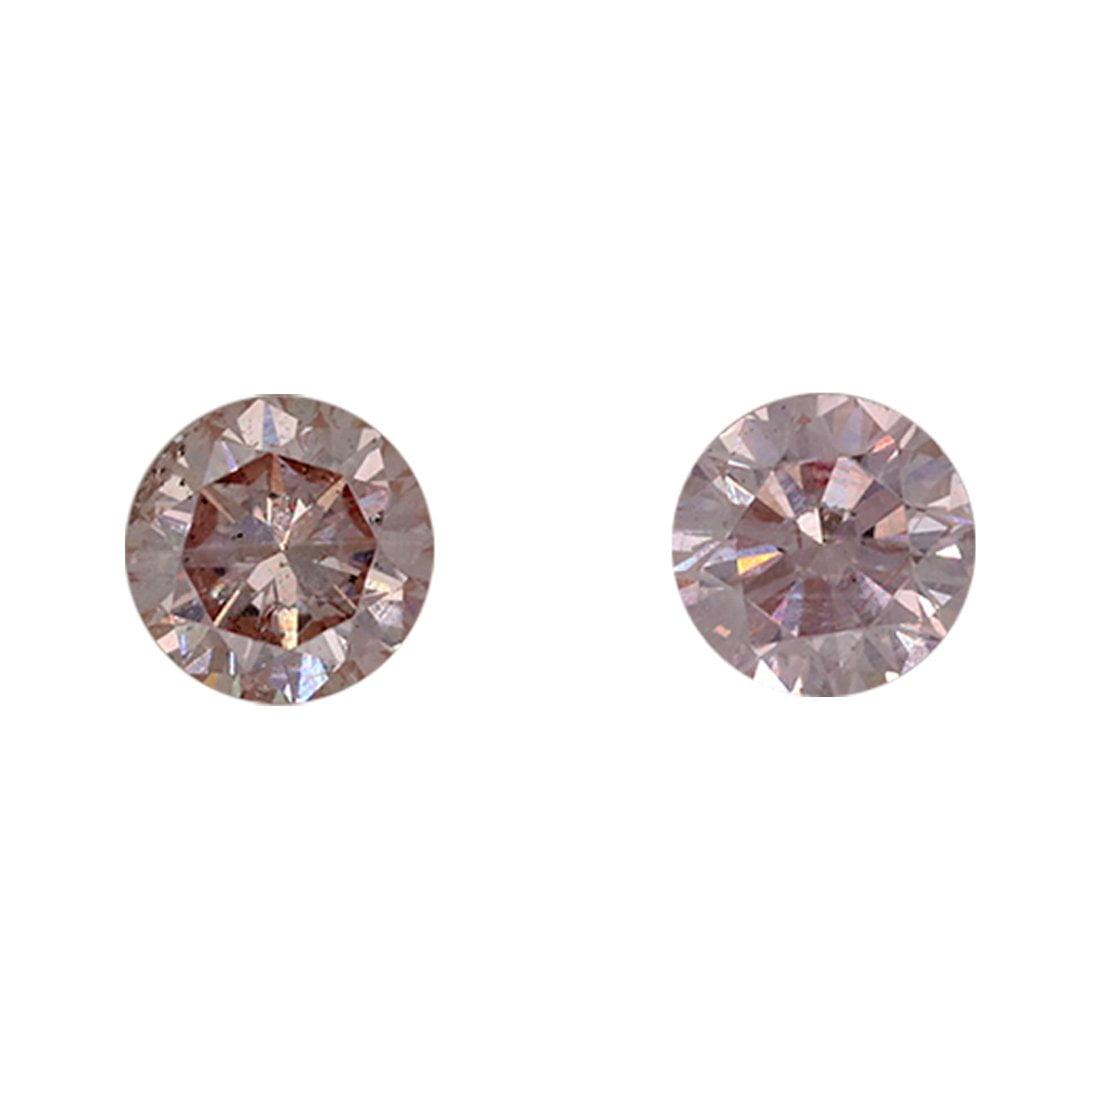 2=0.49ct Natural Fancy Light Pink, 7P Argyle Diamond